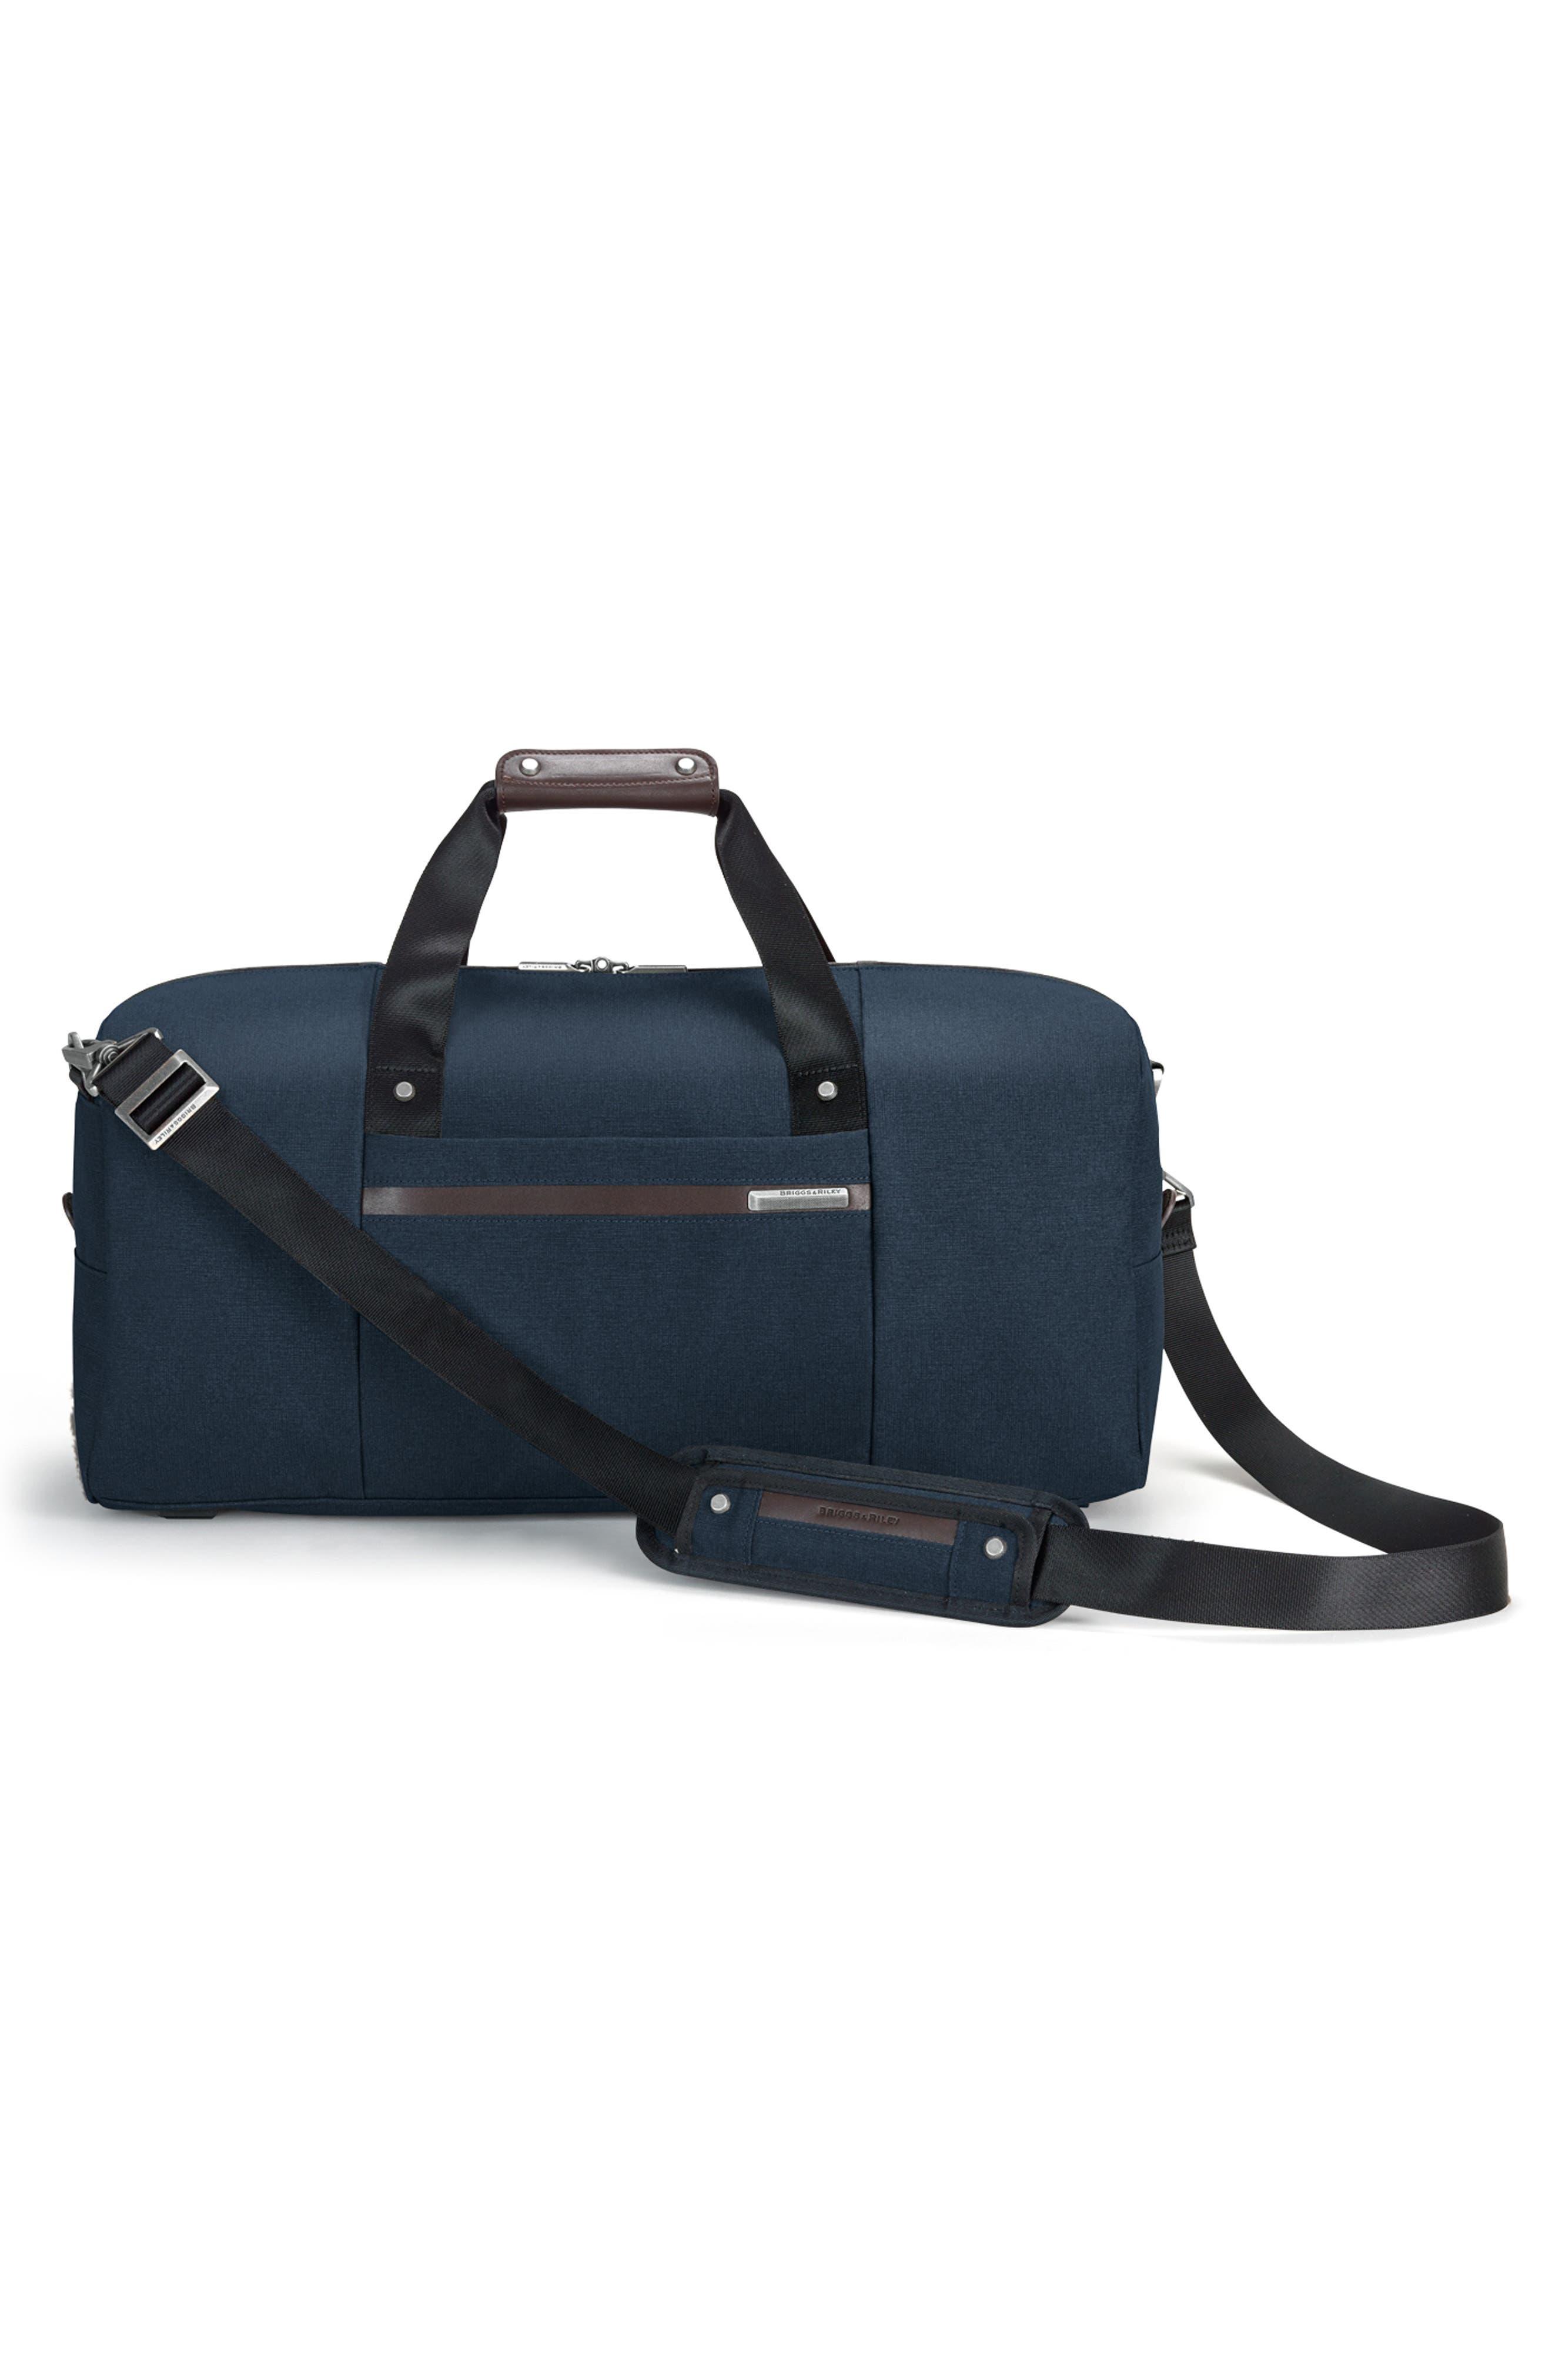 Kinzie Street - Simple Duffel Bag,                             Alternate thumbnail 6, color,                             410